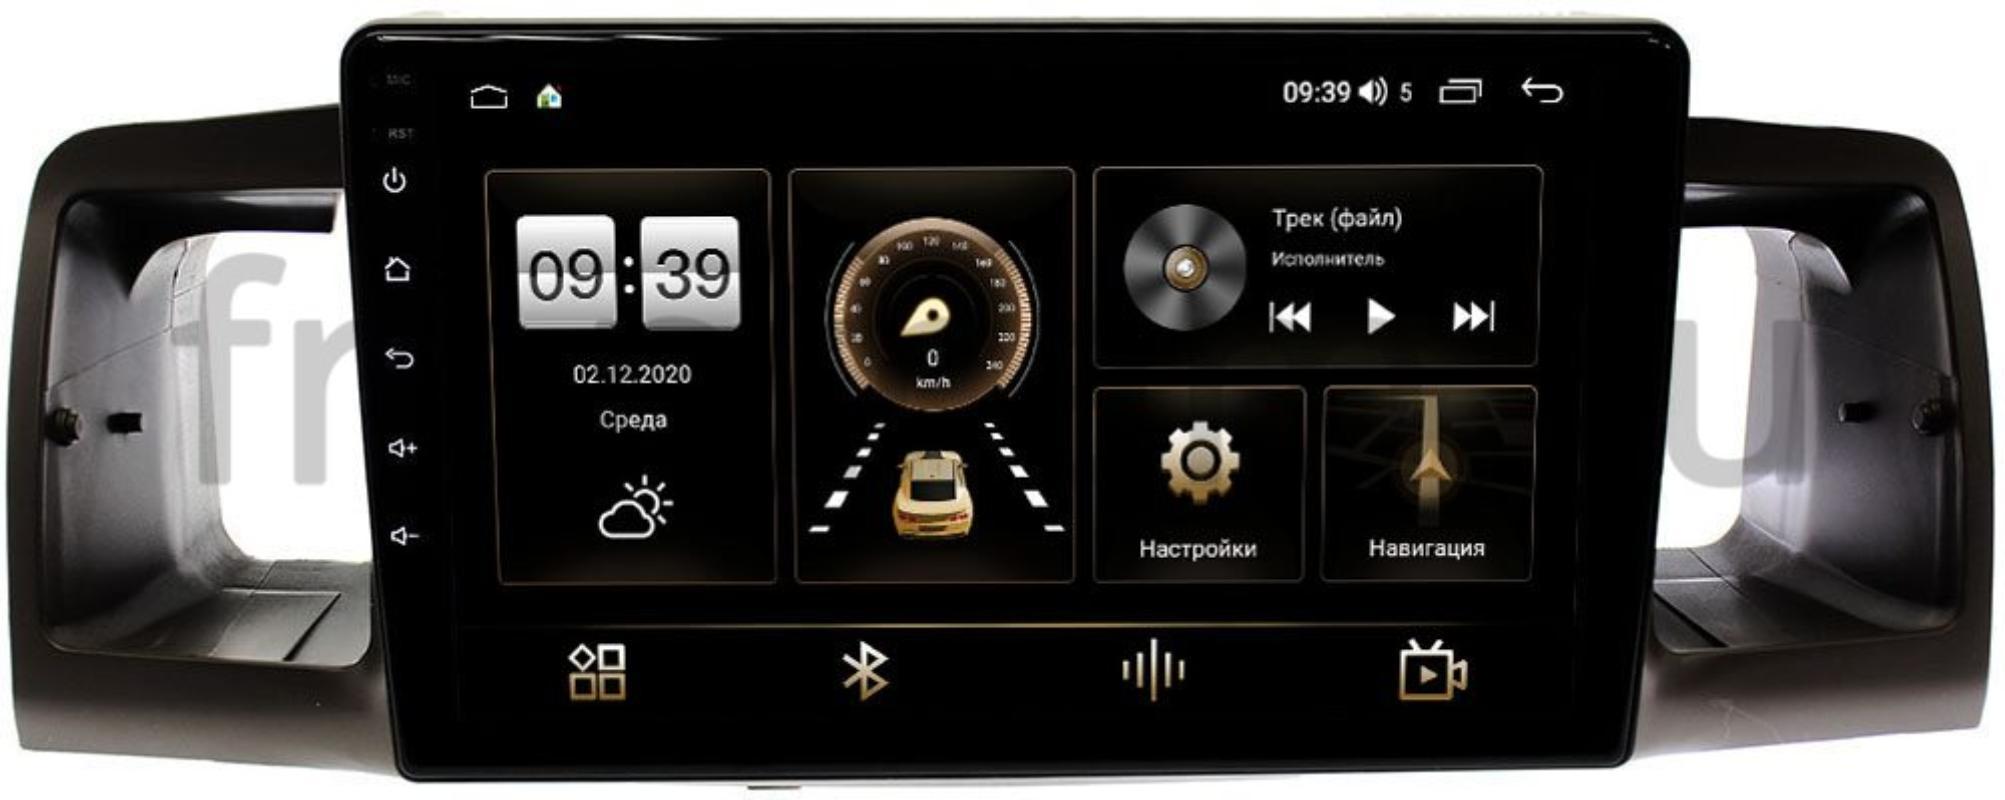 Штатная магнитола Toyota Corolla IX 2000-2007 LeTrun 4196-9074 на Android 10 (6/128, DSP, QLed) С оптическим выходом (+ Камера заднего вида в подарок!)